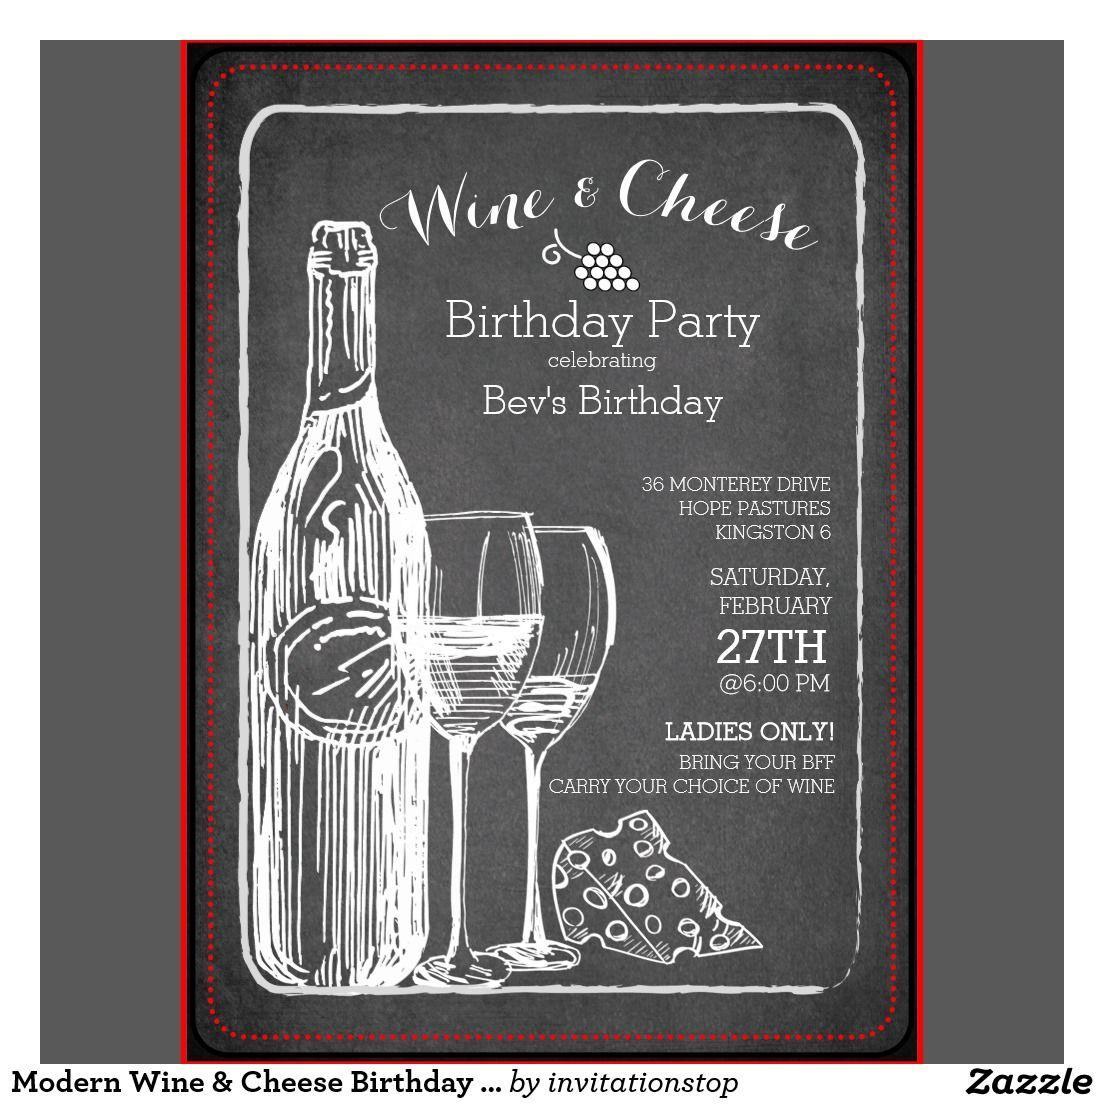 2ND FINAL   Modern Wine & Cheese Birthday Party Invitation   Work ...